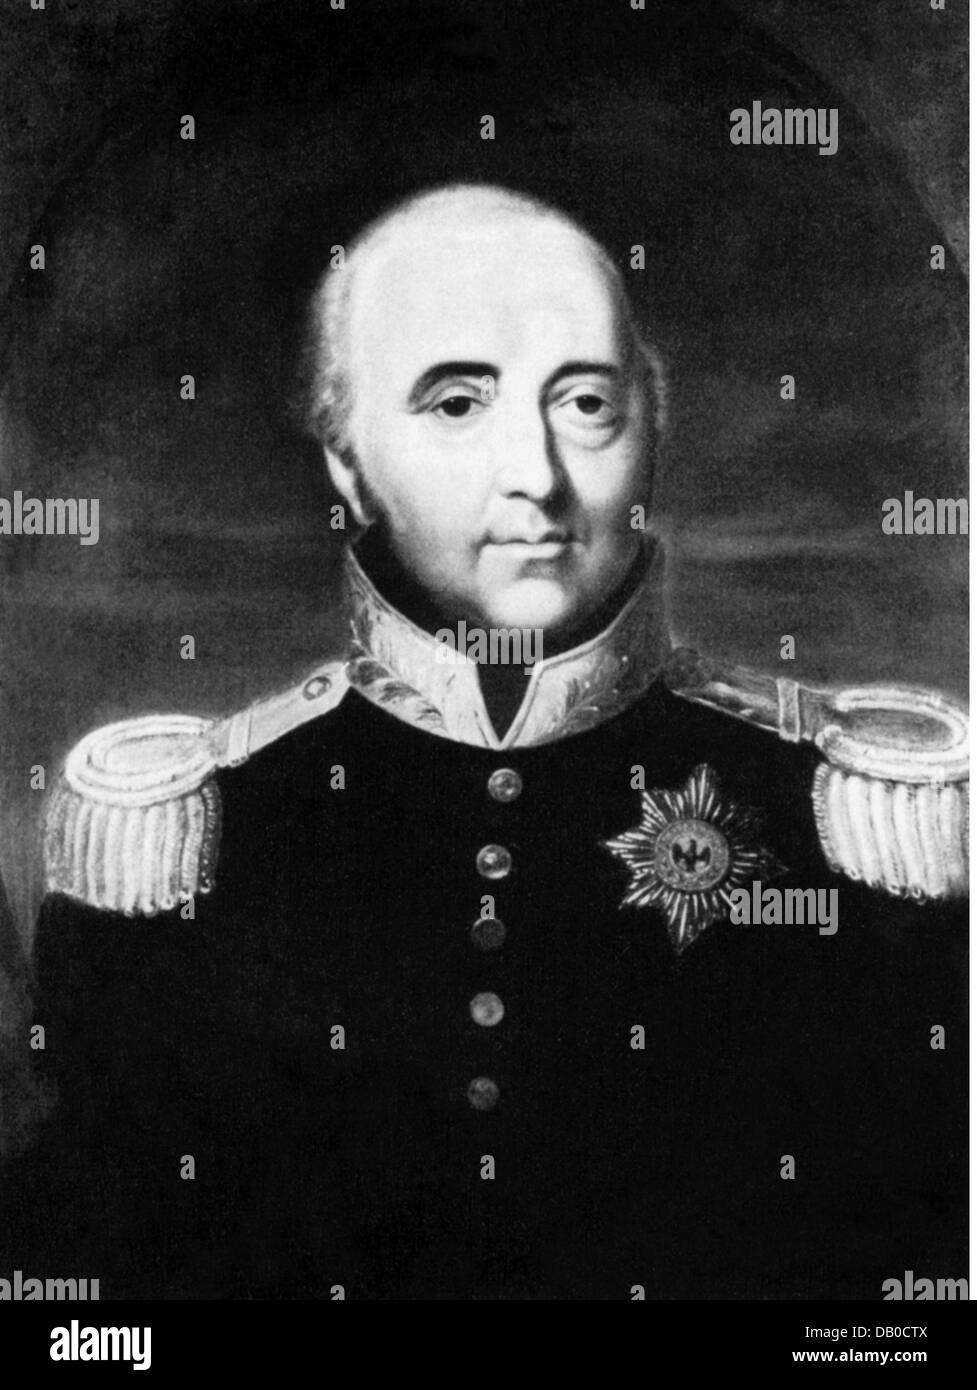 Alexius Frederick Christian, 12.6.1767 - 24.3.1834, Prince of Anhalt-Bernburg 9.4.1796 - 24.3.1834, portrait, after - Stock Image